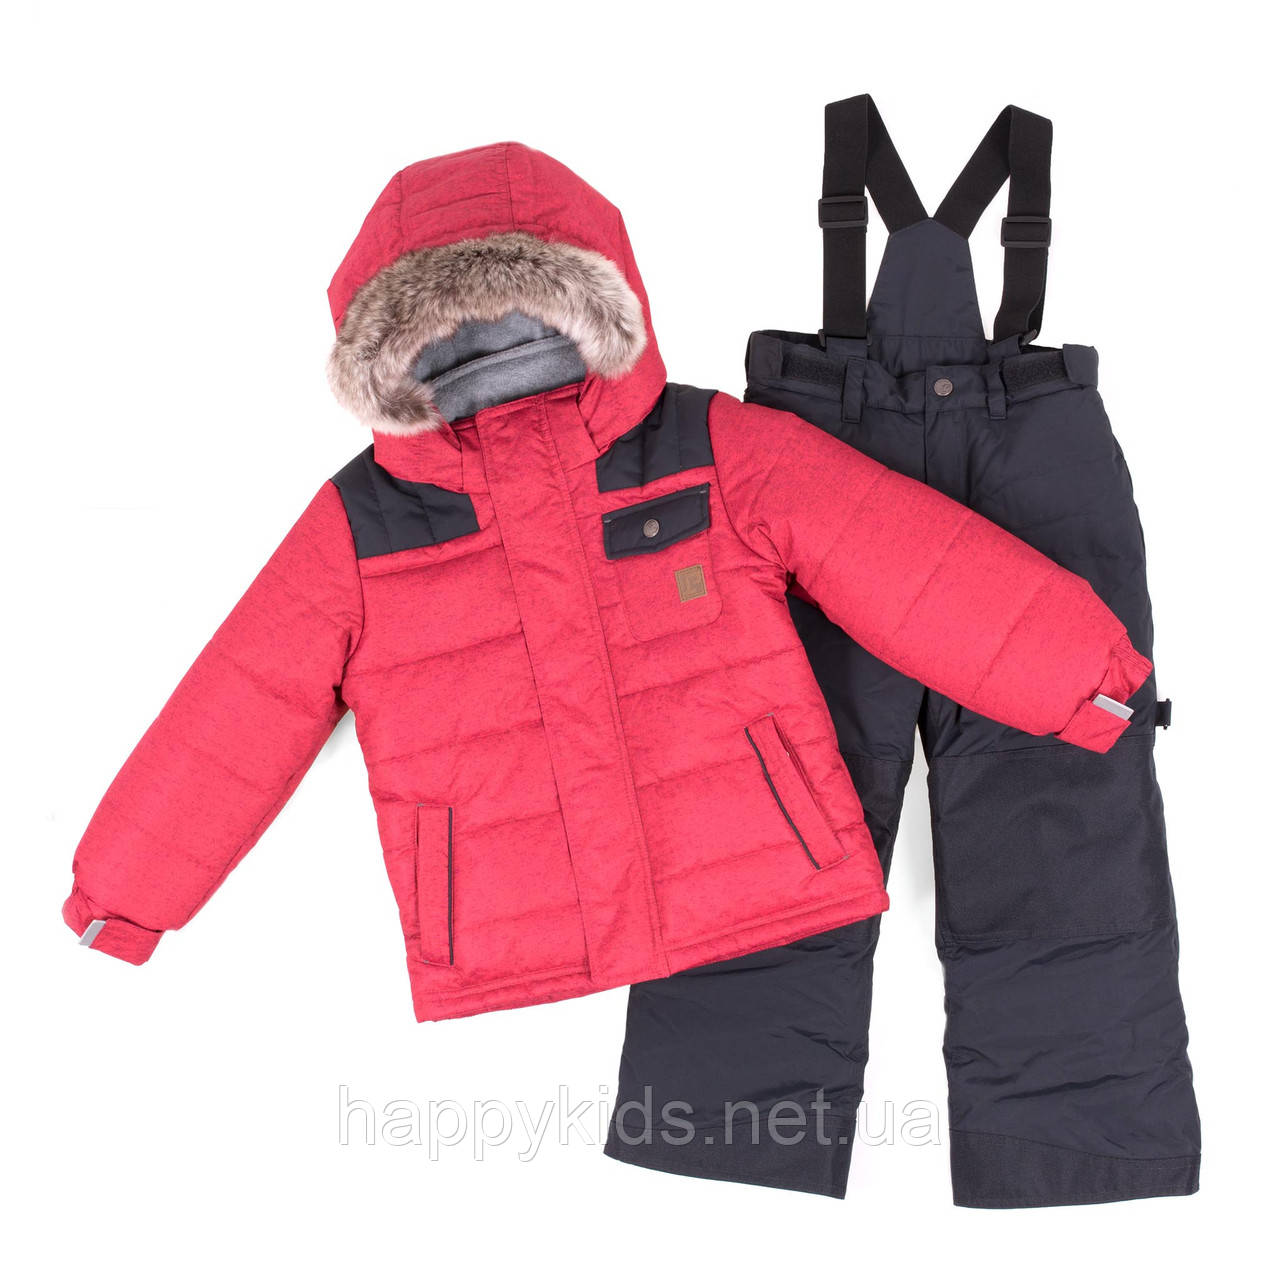 Зимний комплект для мальчика PELUCHE F18 M 63 EG Really Red / Deep Gray. Размеры 3-8.